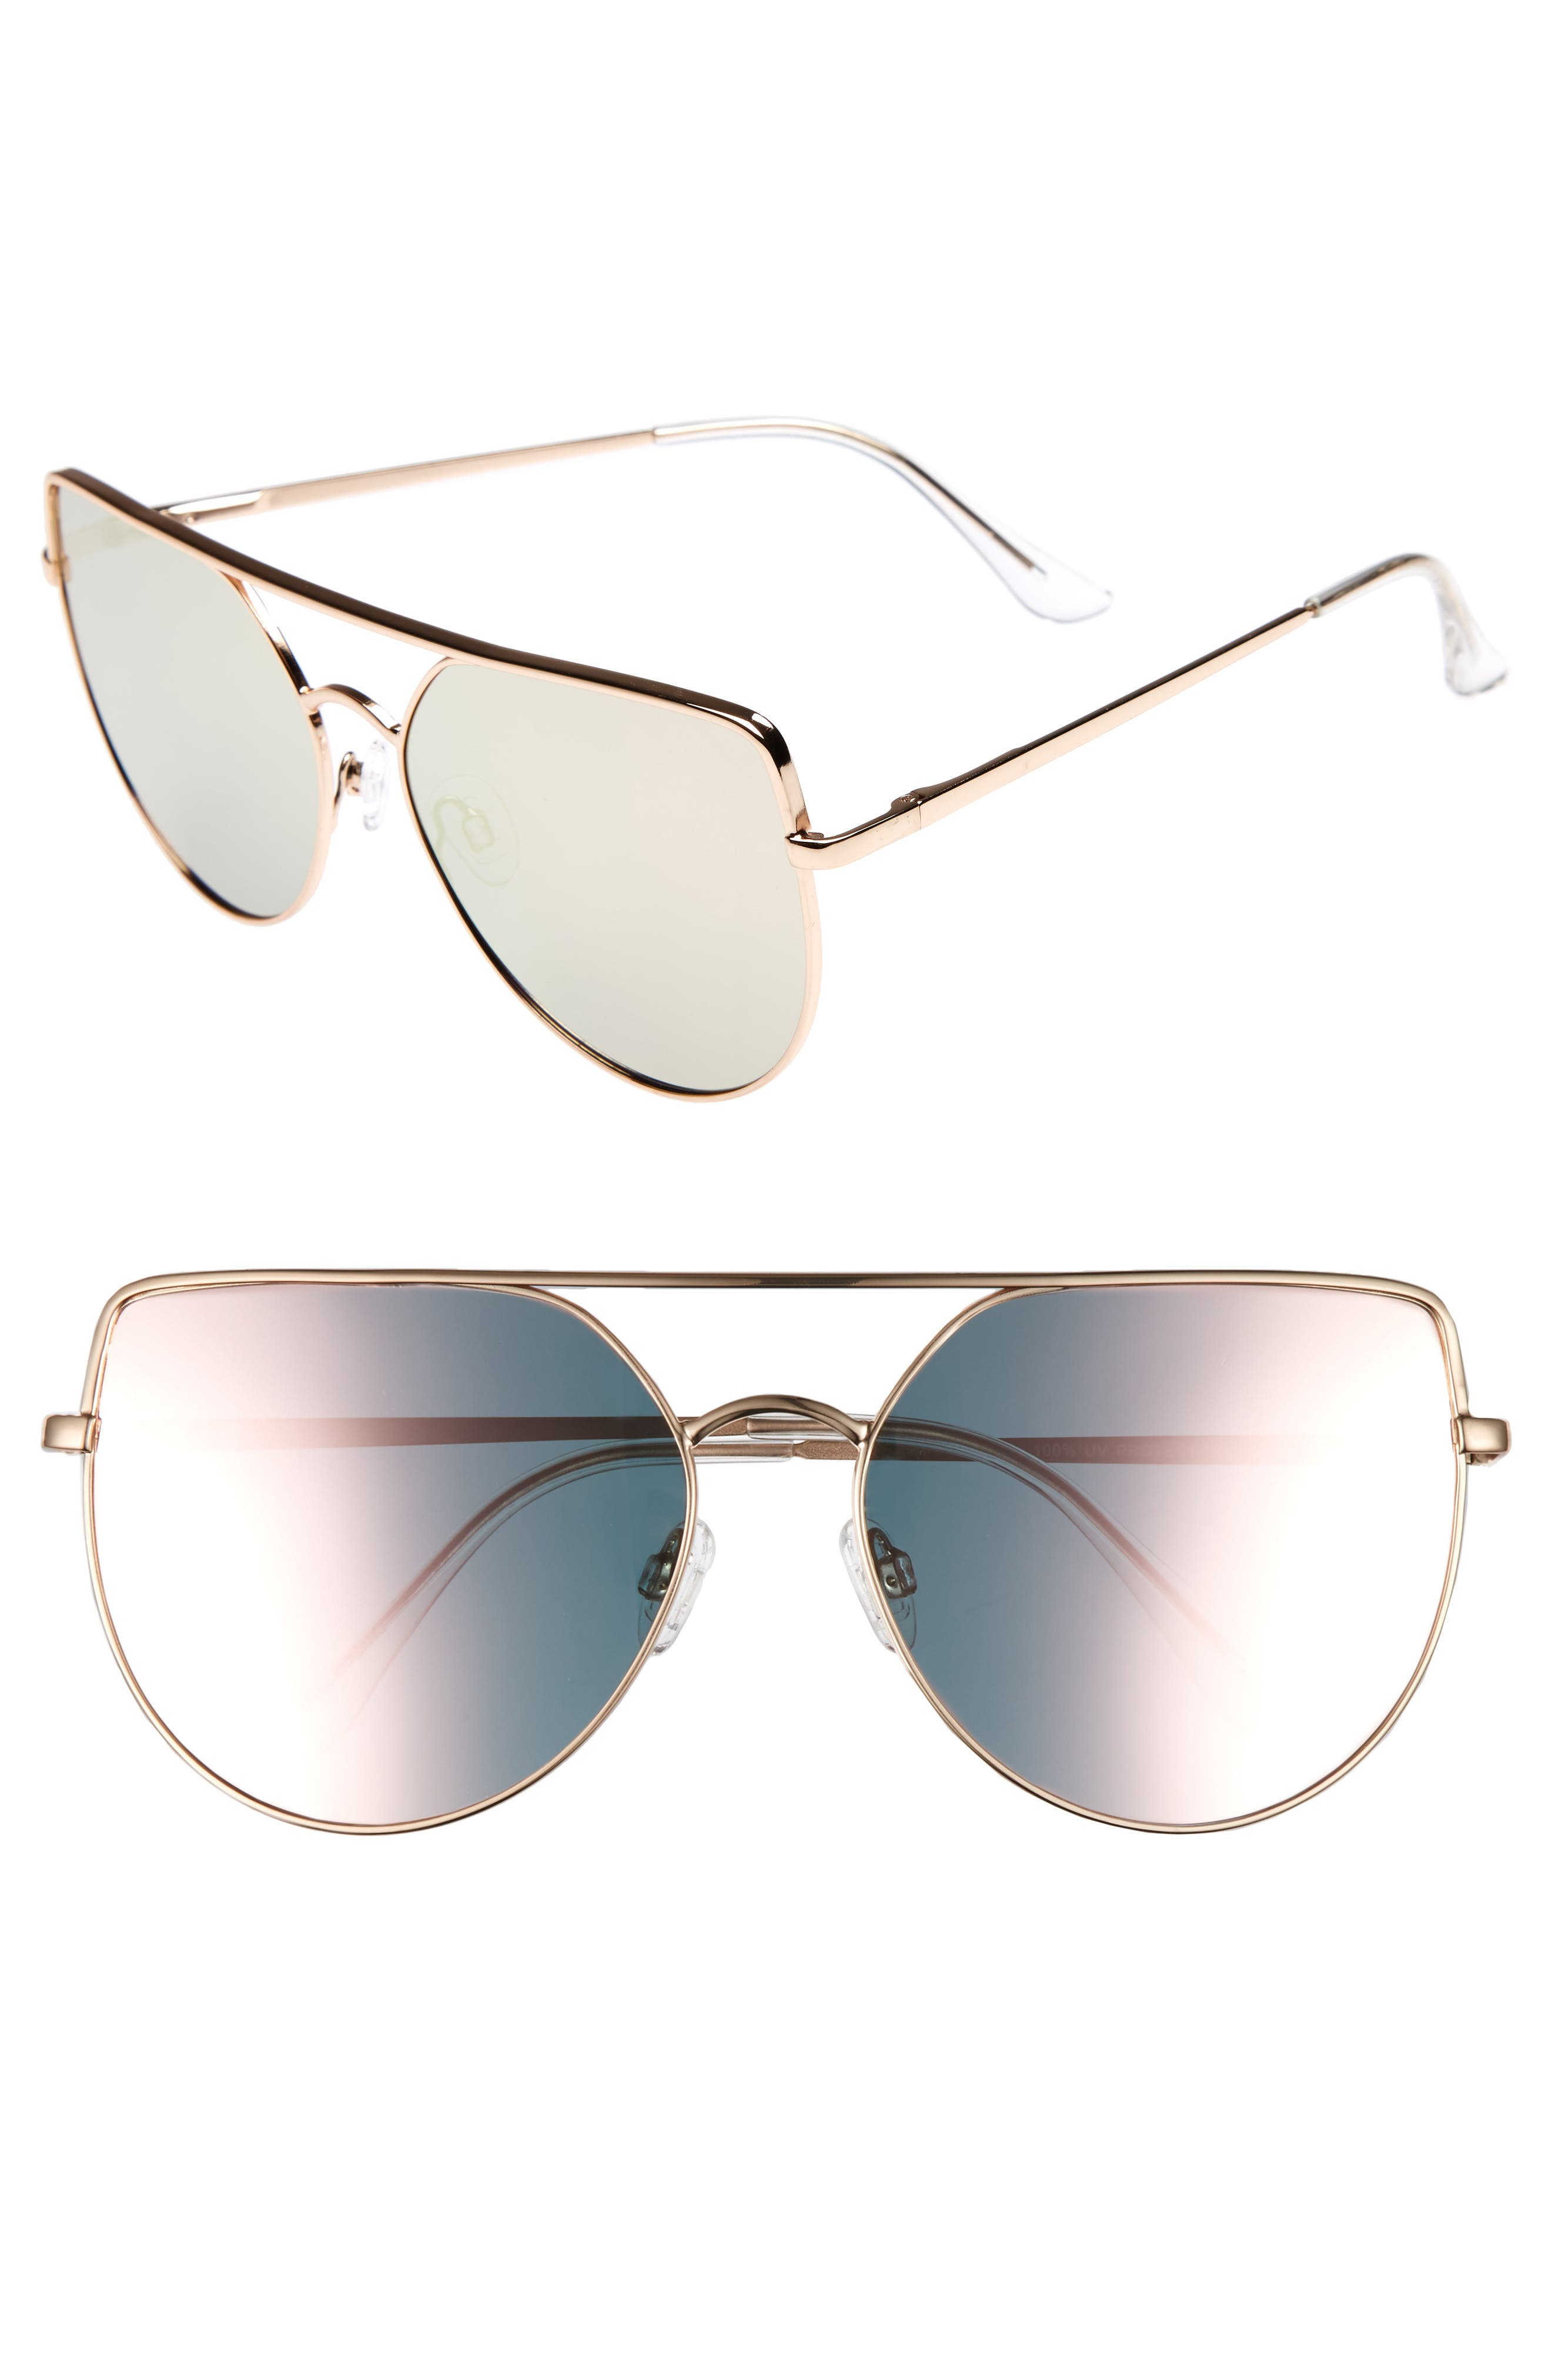 60mm Aviator Sunglasses,                             Main thumbnail 2, color,